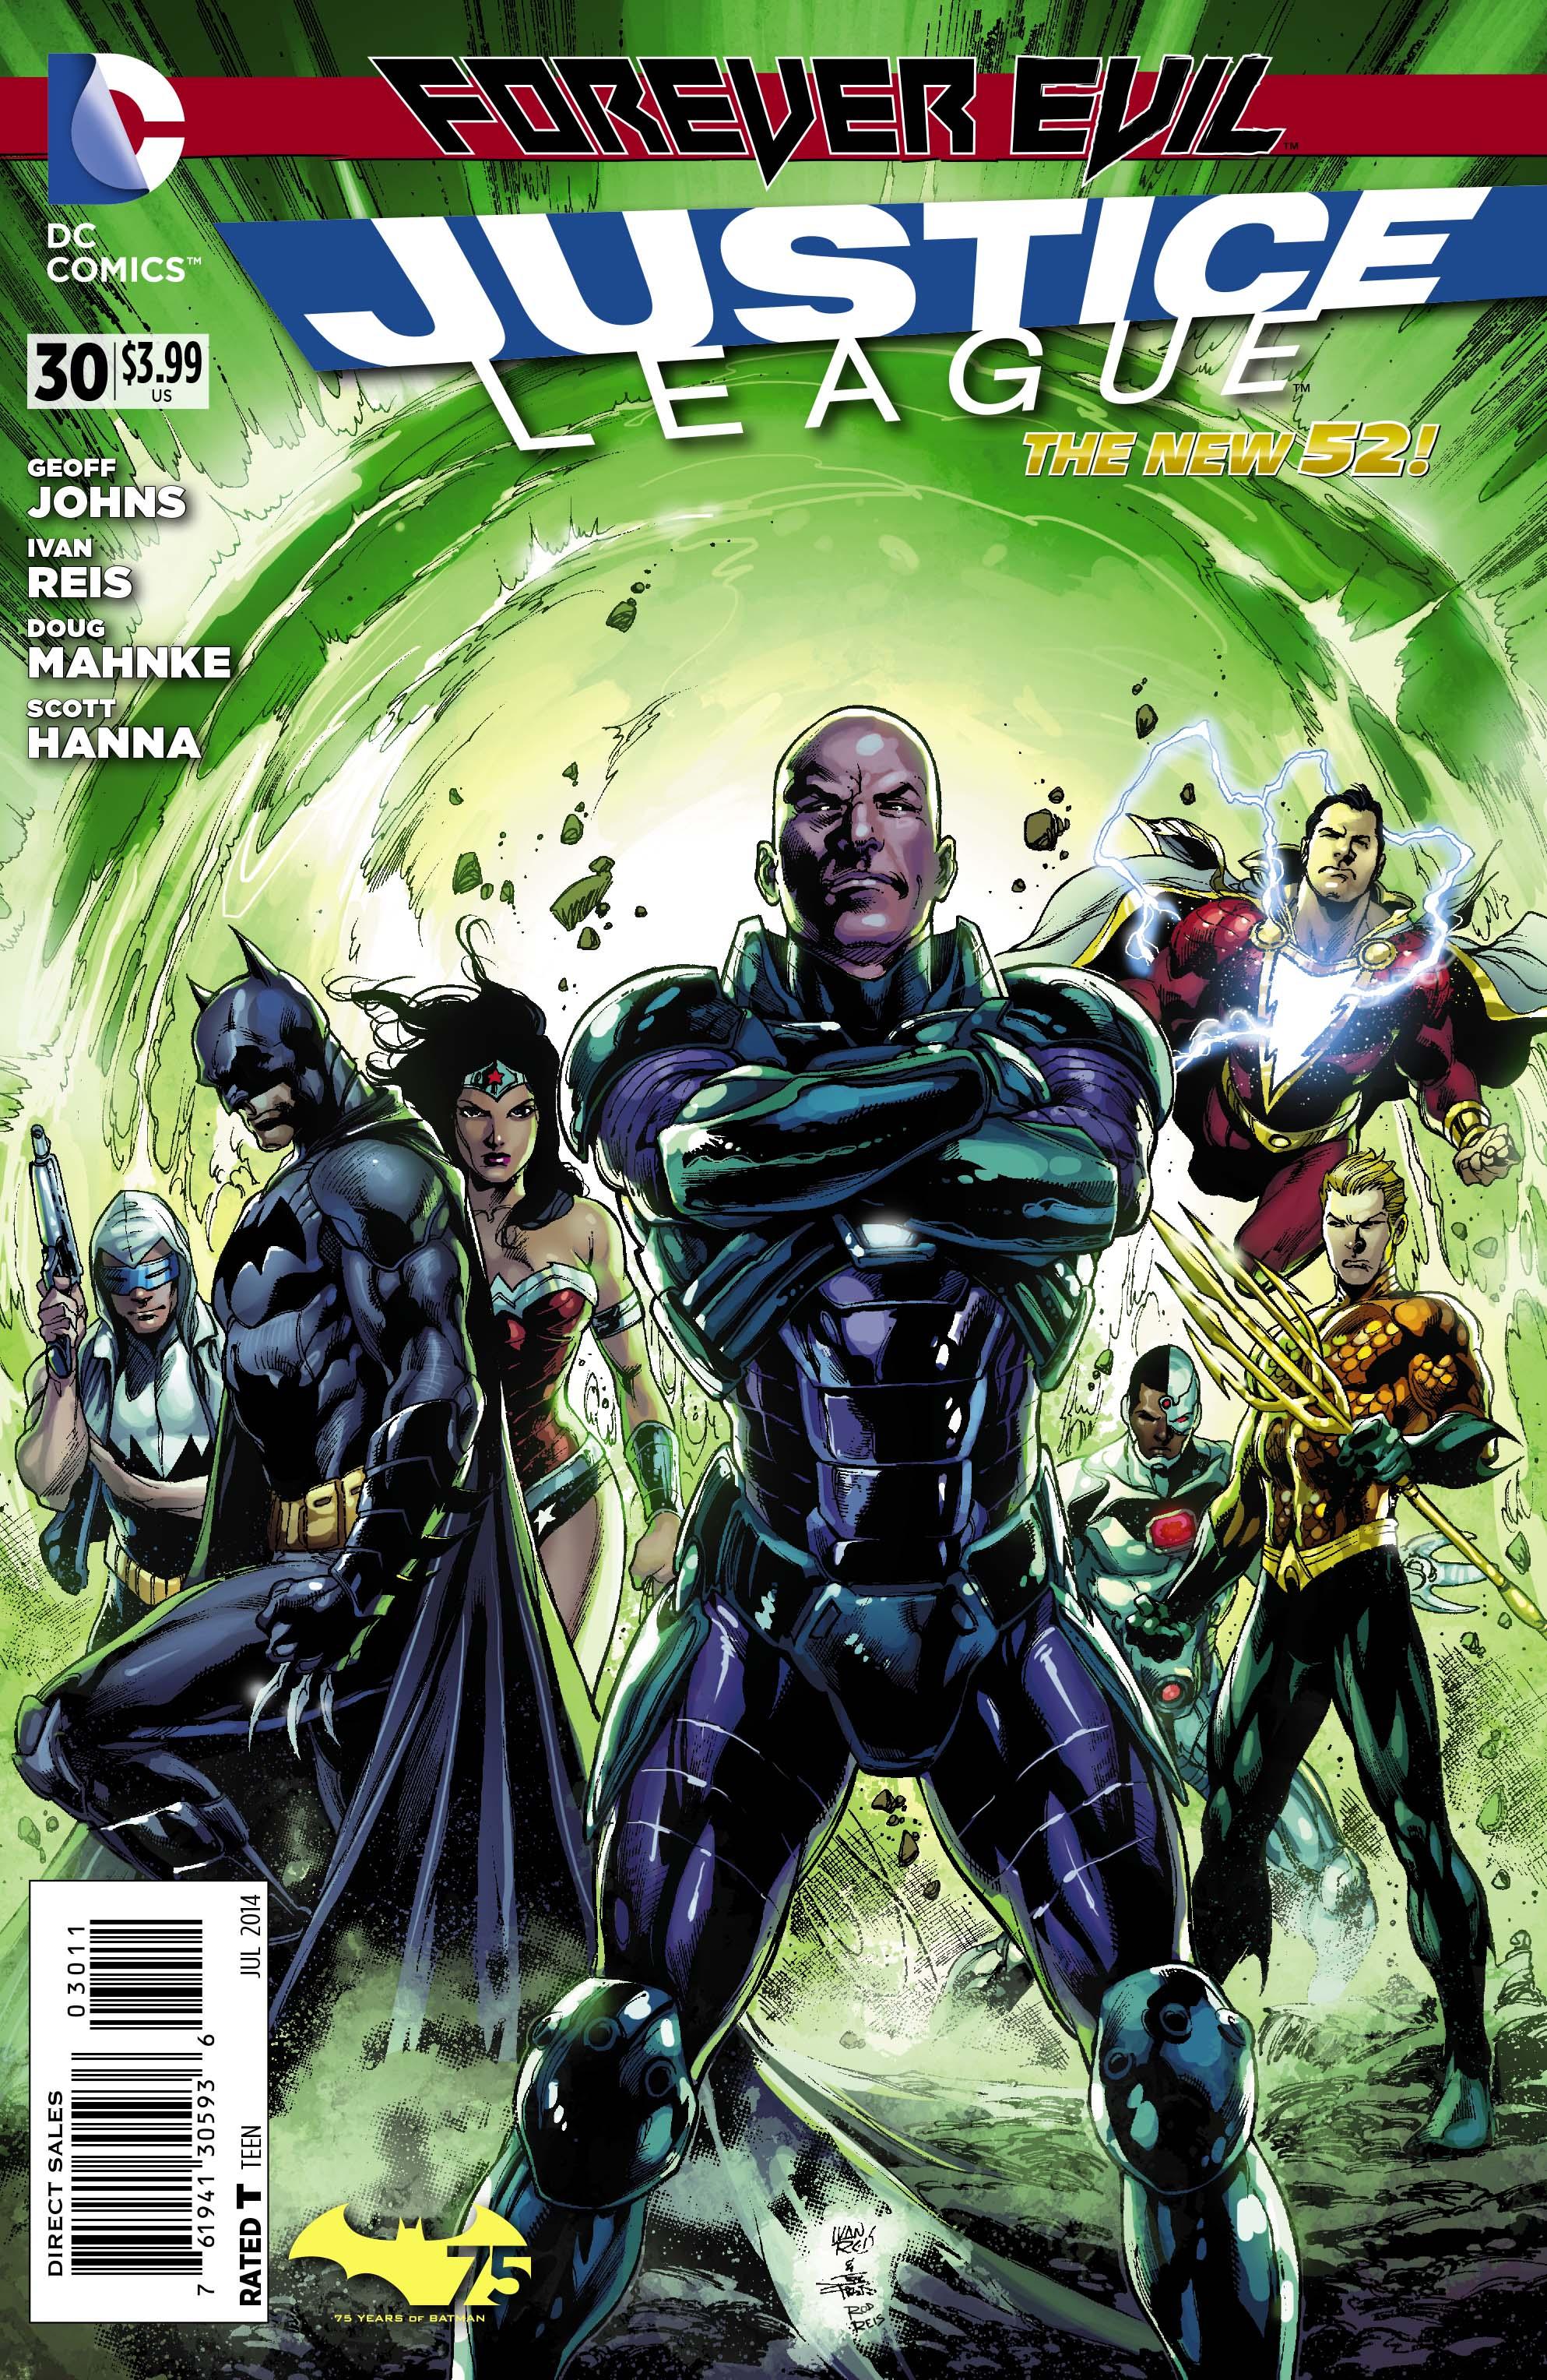 Justice League Vol.2 #30